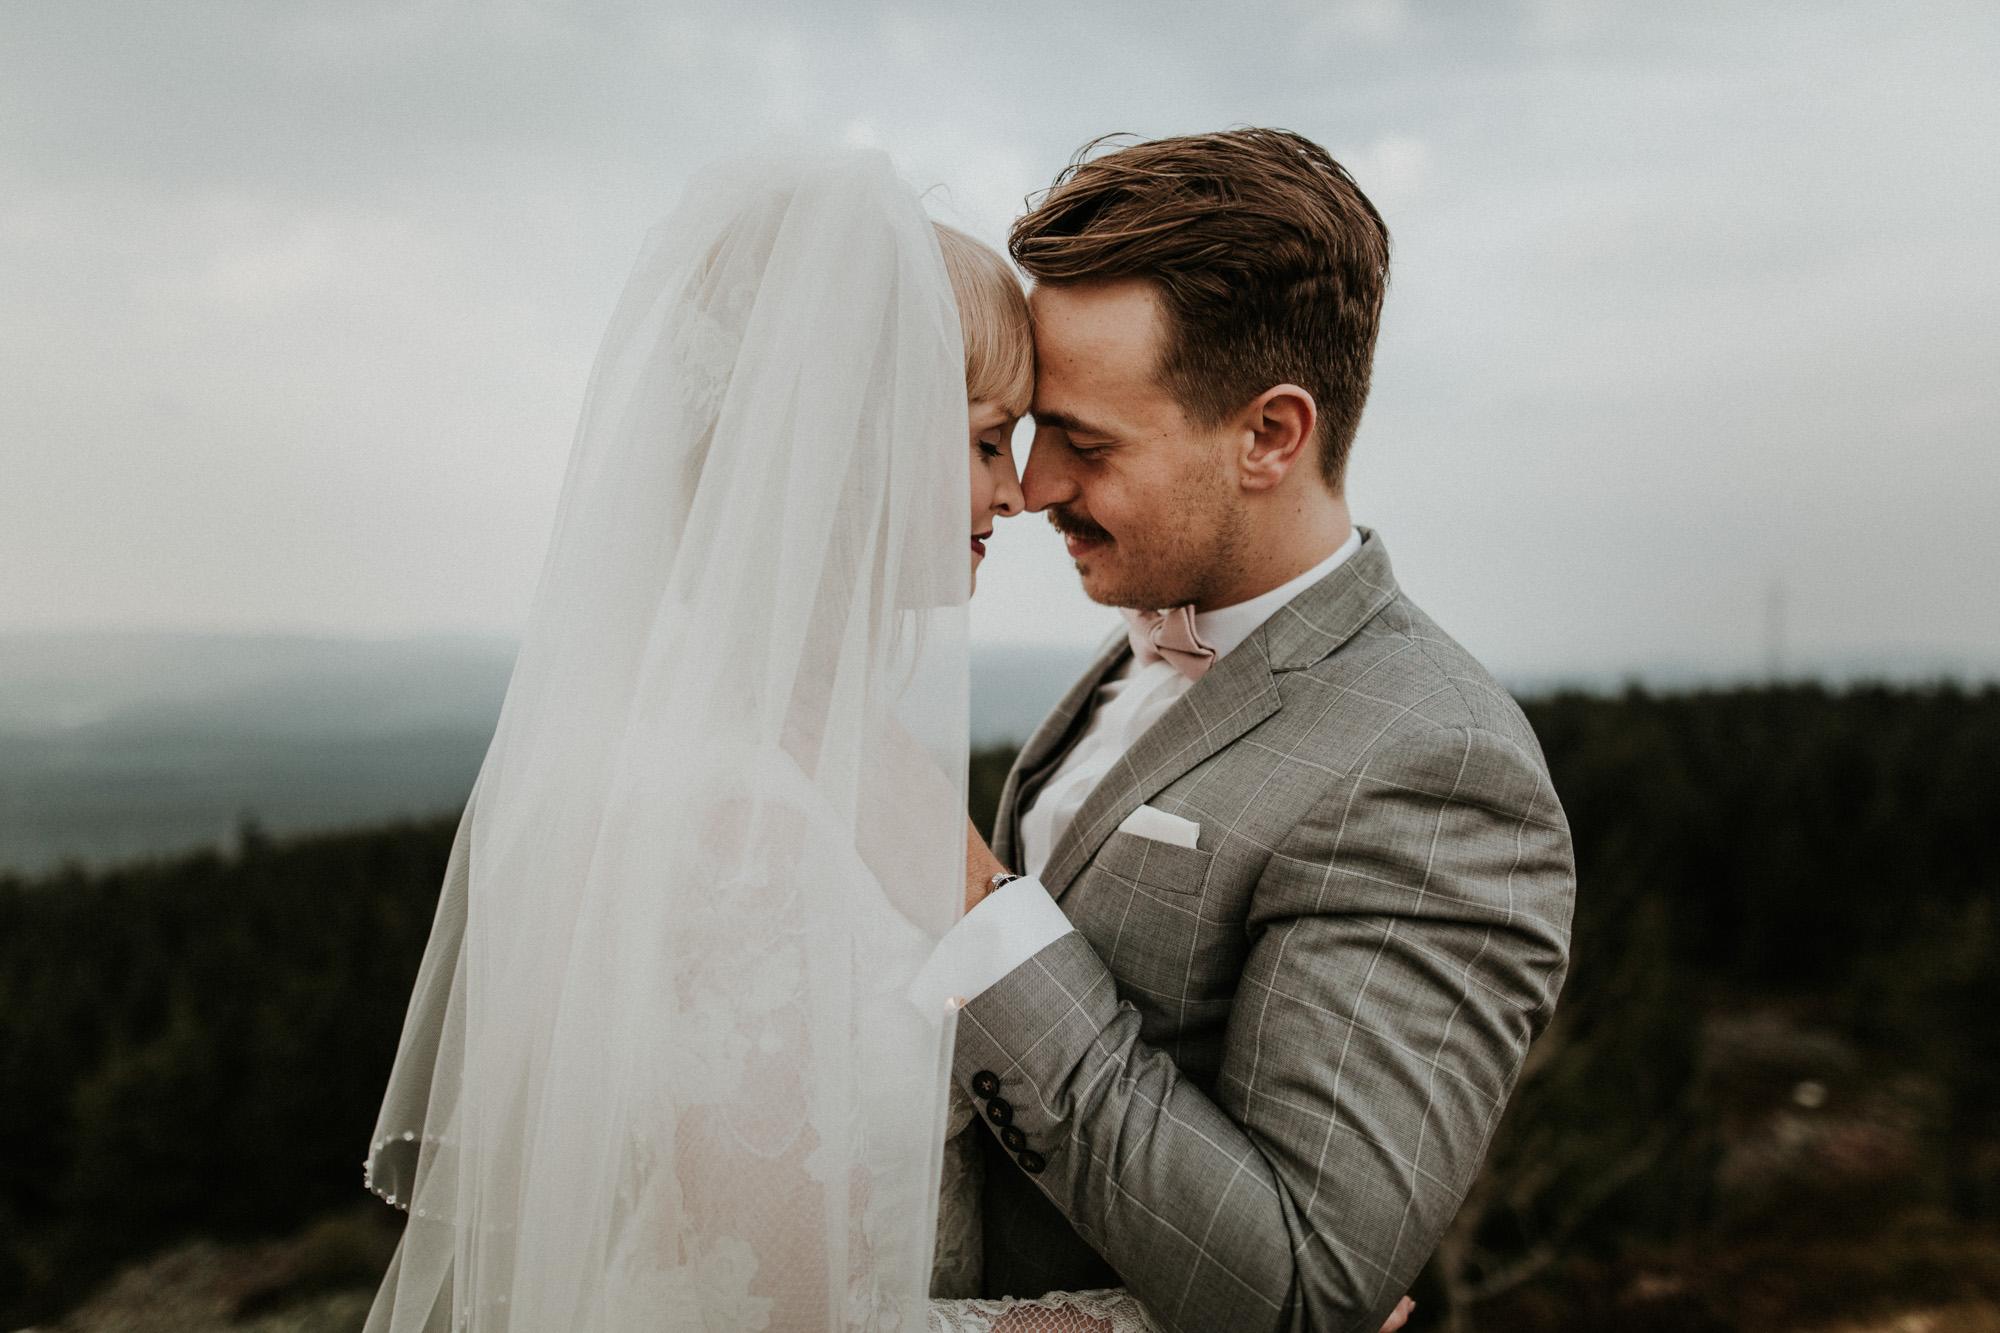 DanielaMarquardtPhotography_Hochzeitsfotograf_Düsseldorf_Köln_Mallorca_Bayern_Austria_Harz_LinaundMaik_Afterwedding-Shooting_Weddingphotographer_Ibiza_Tuskany_Italien_Toskana46